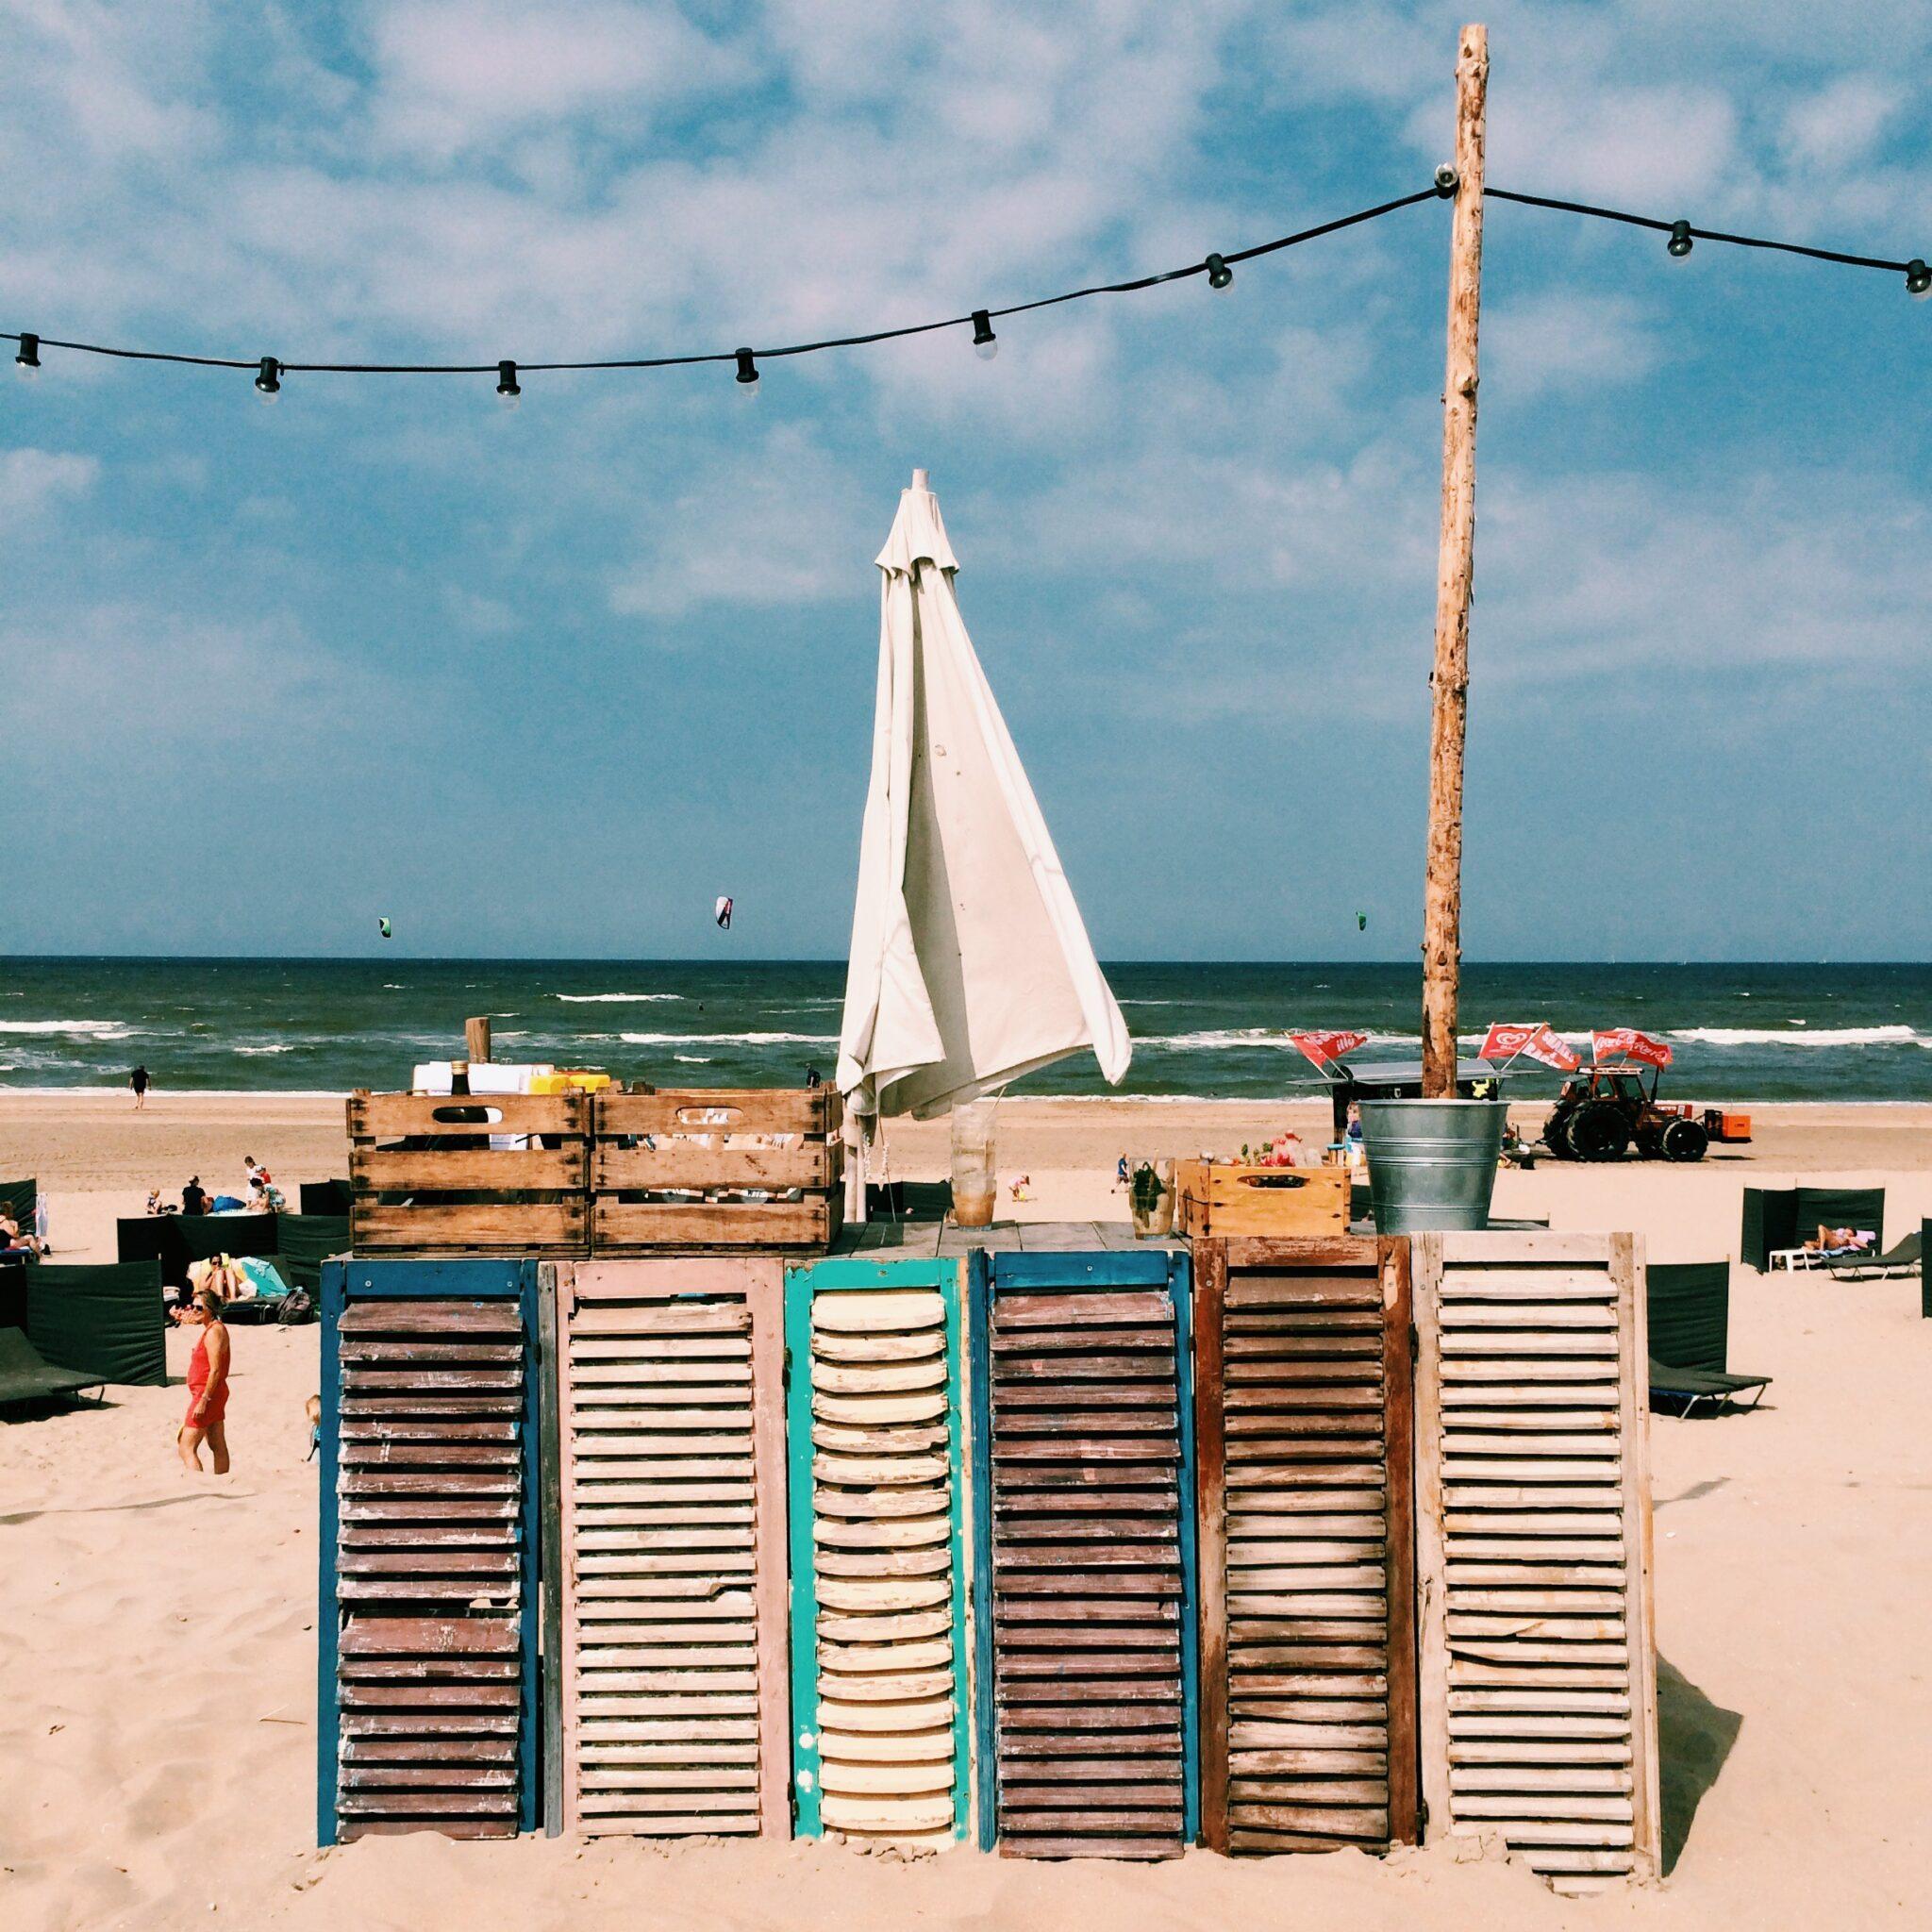 IMG 1125 e1407050237116 - Ultimate chillings at UBUNTU Beach